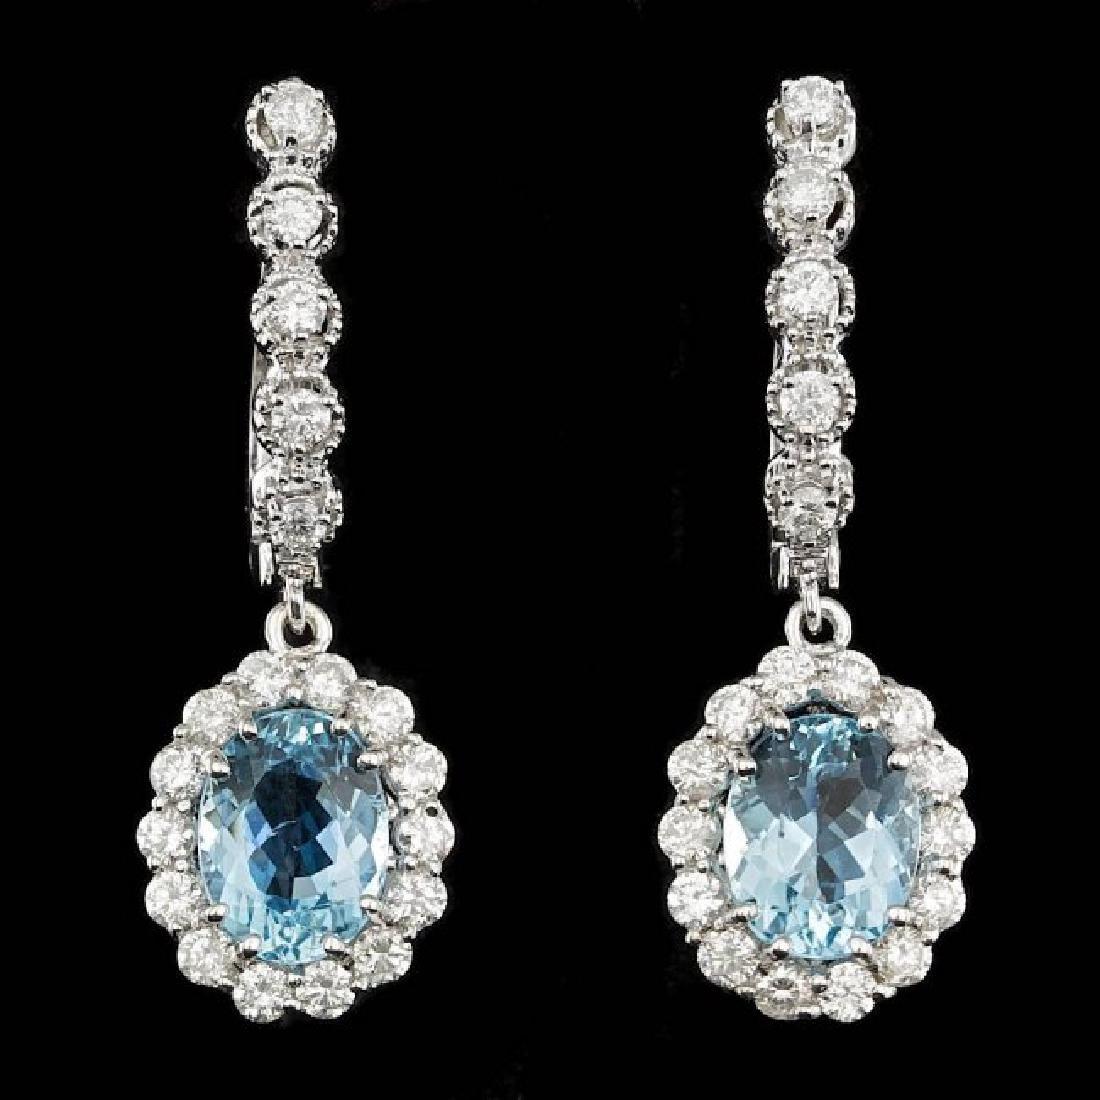 14k 3.00ct Aquamarine 1.35ct Diamond Earrings